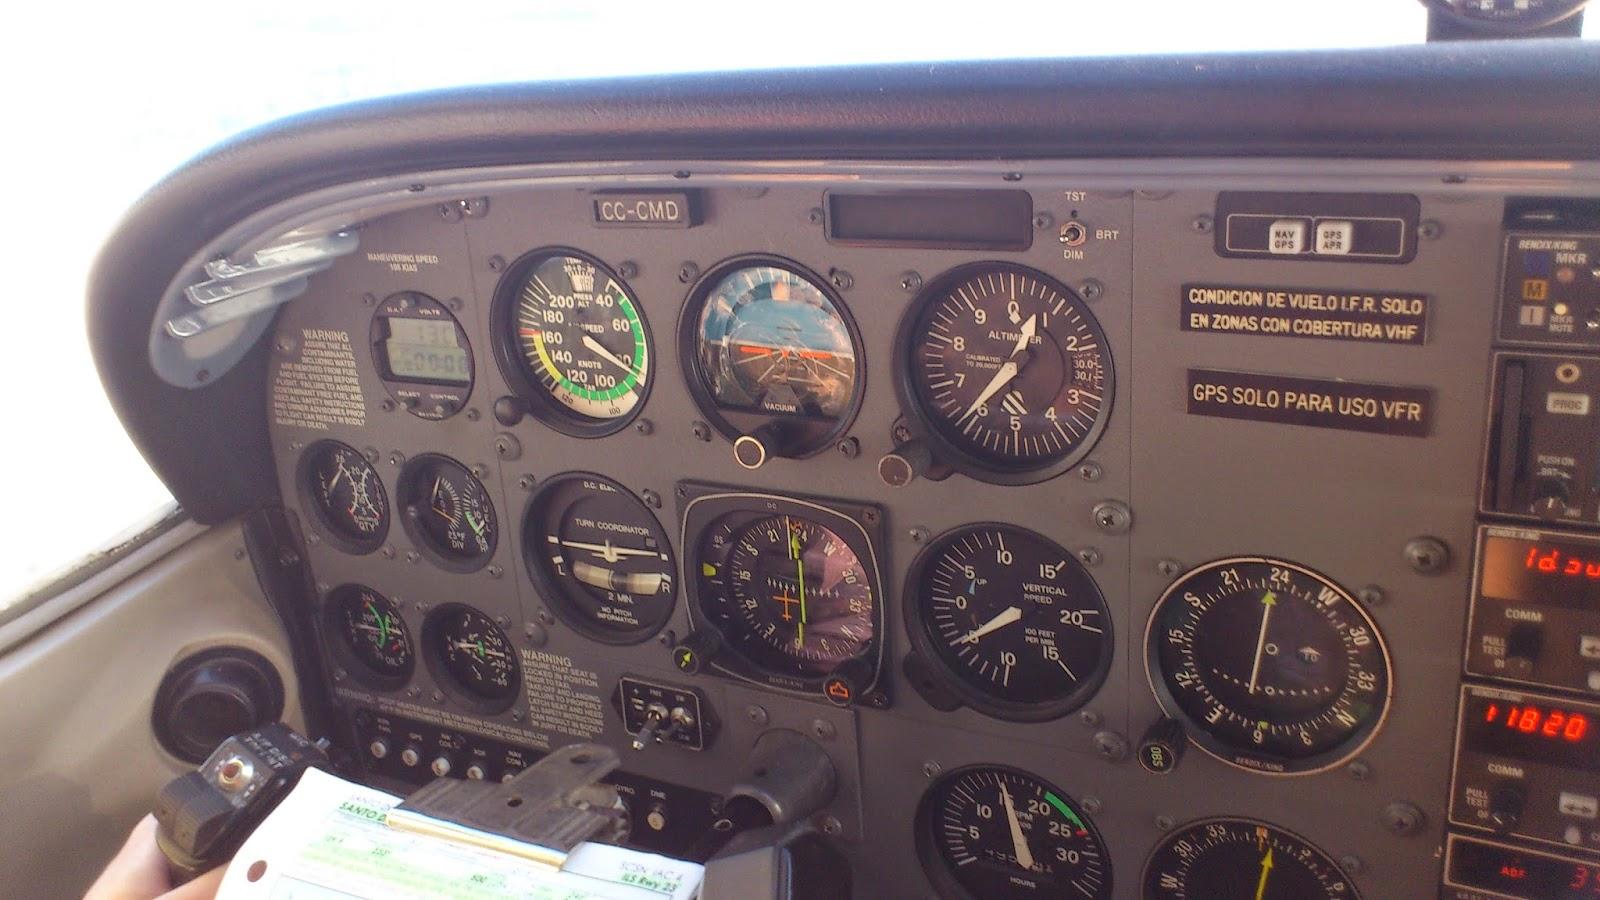 Bitacora de un piloto: mayo 2014